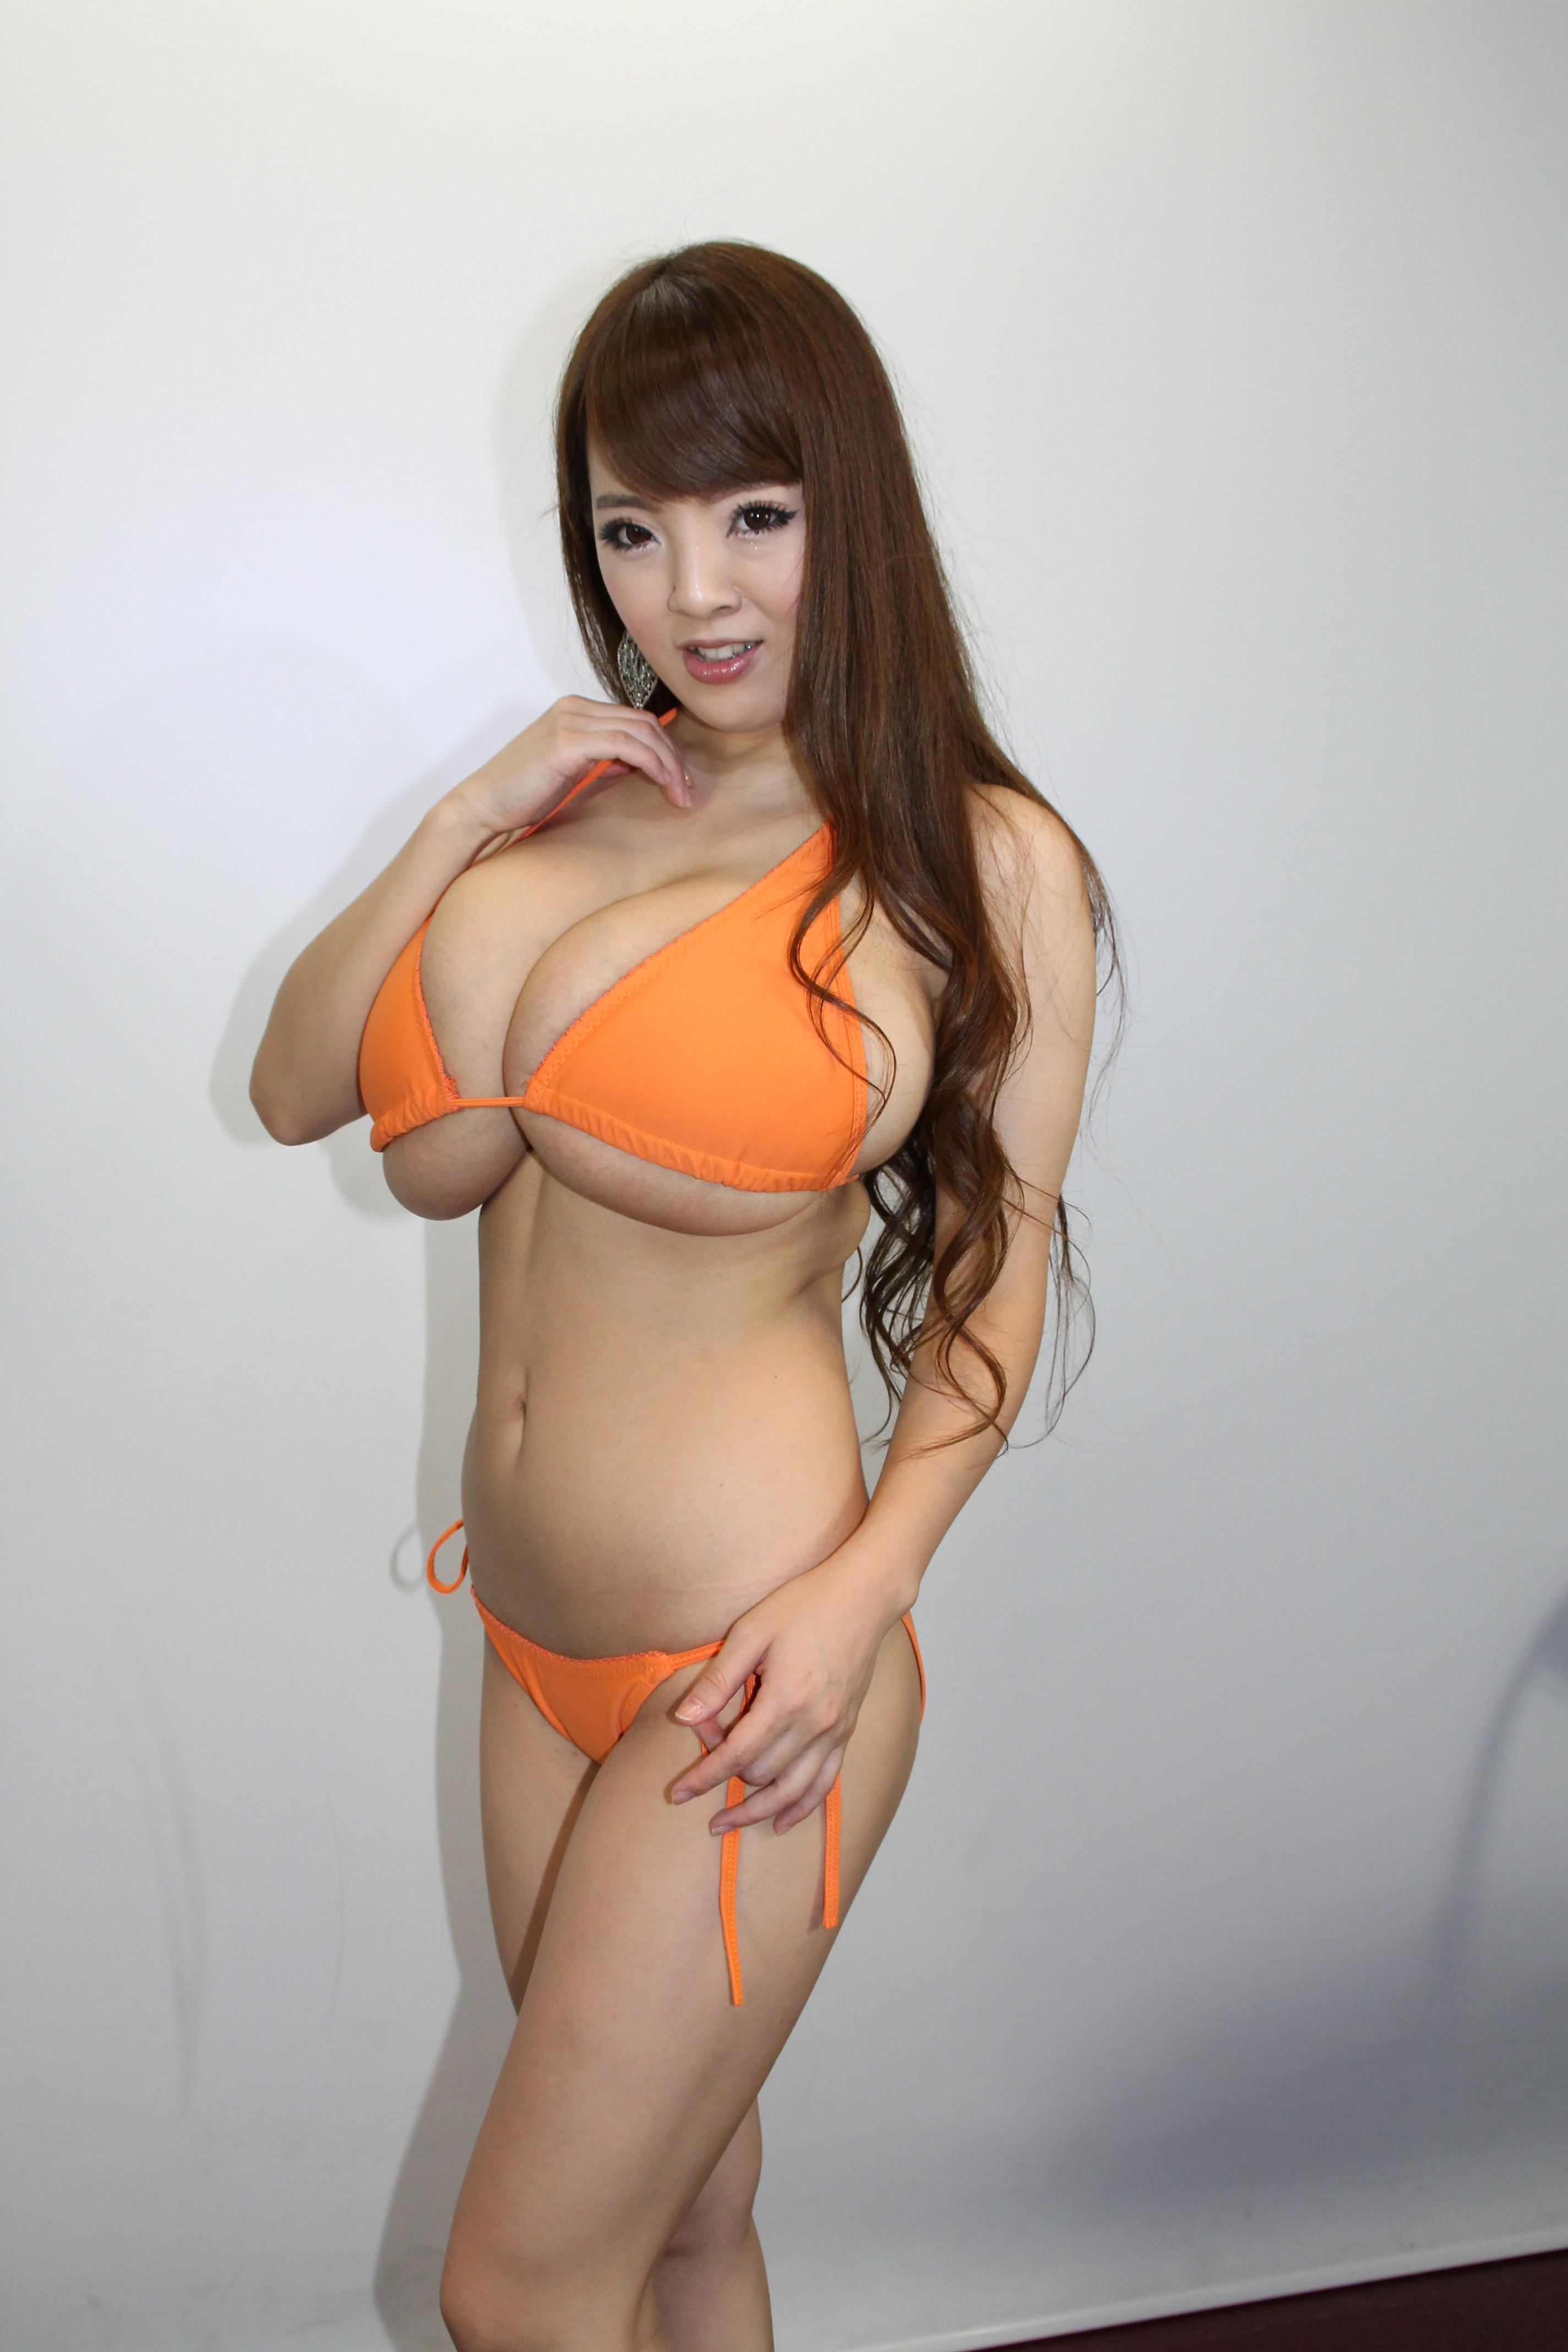 Cg pornfree porn pic